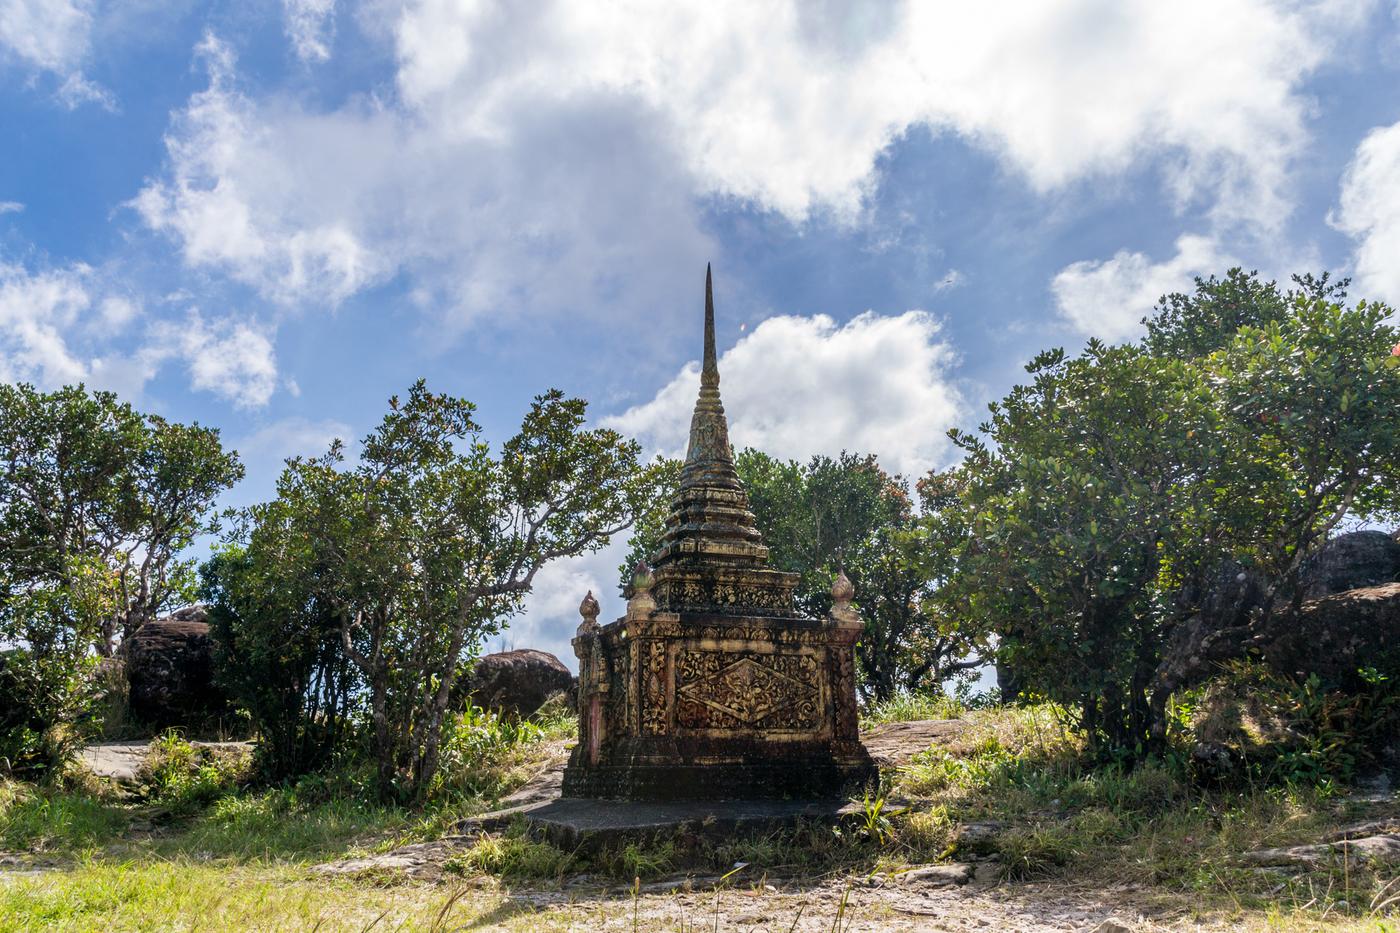 Bokor-buddhist-temple.jpg